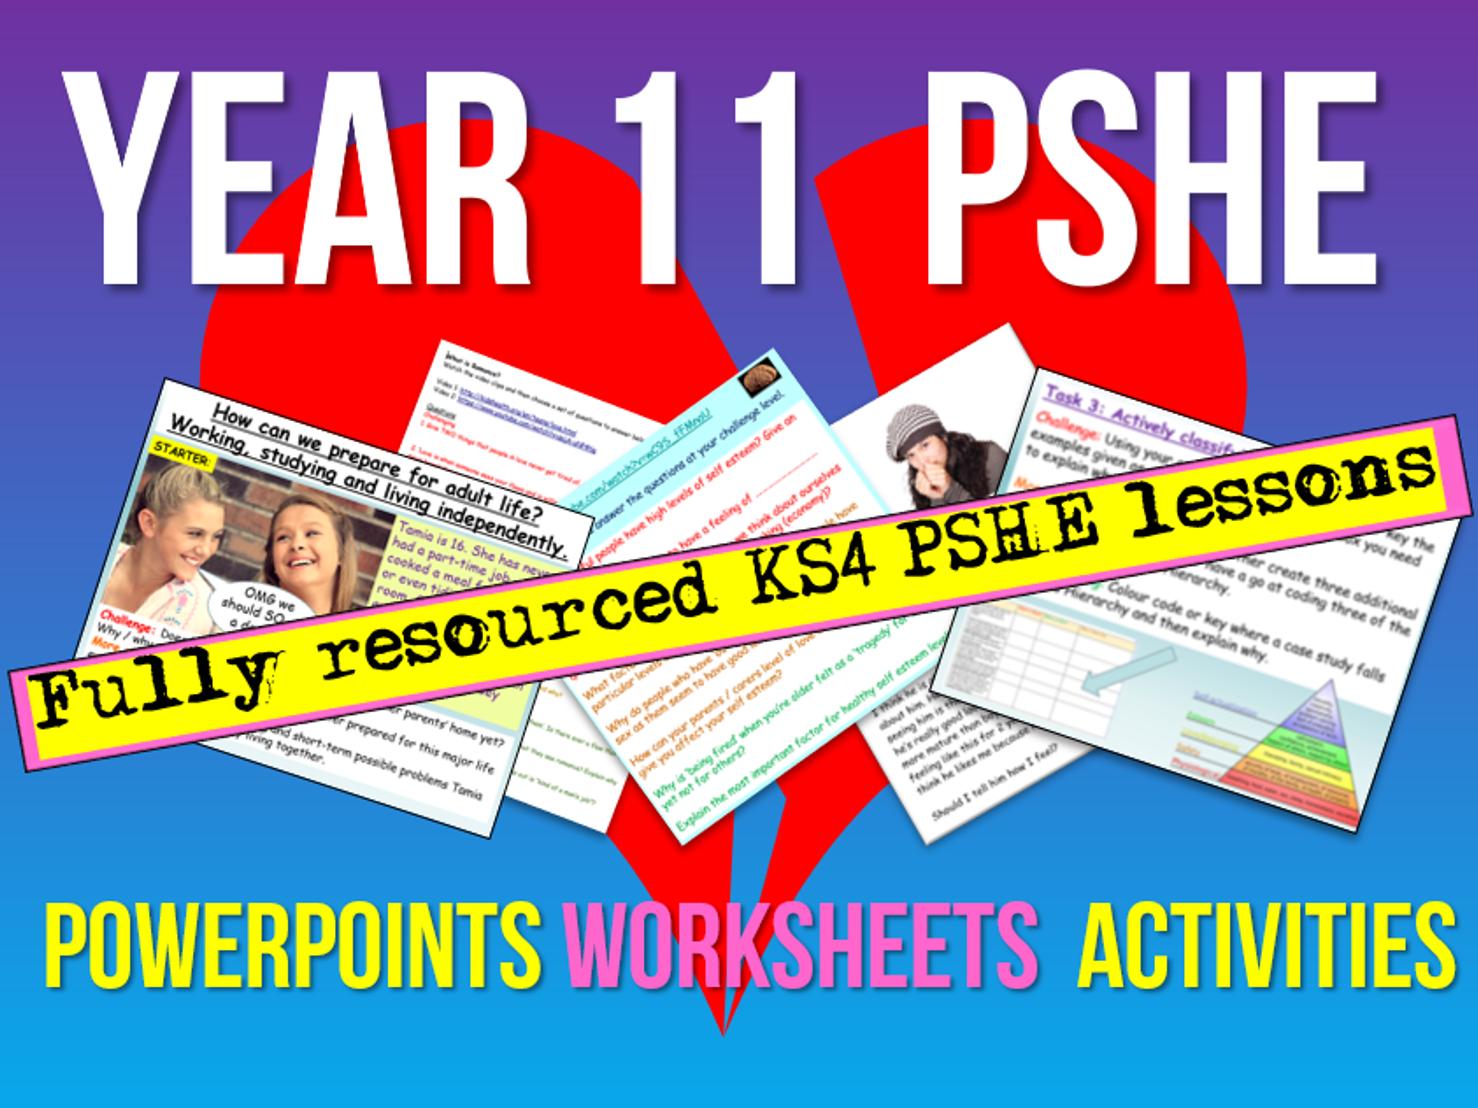 PSHE: Year 11 / KS4